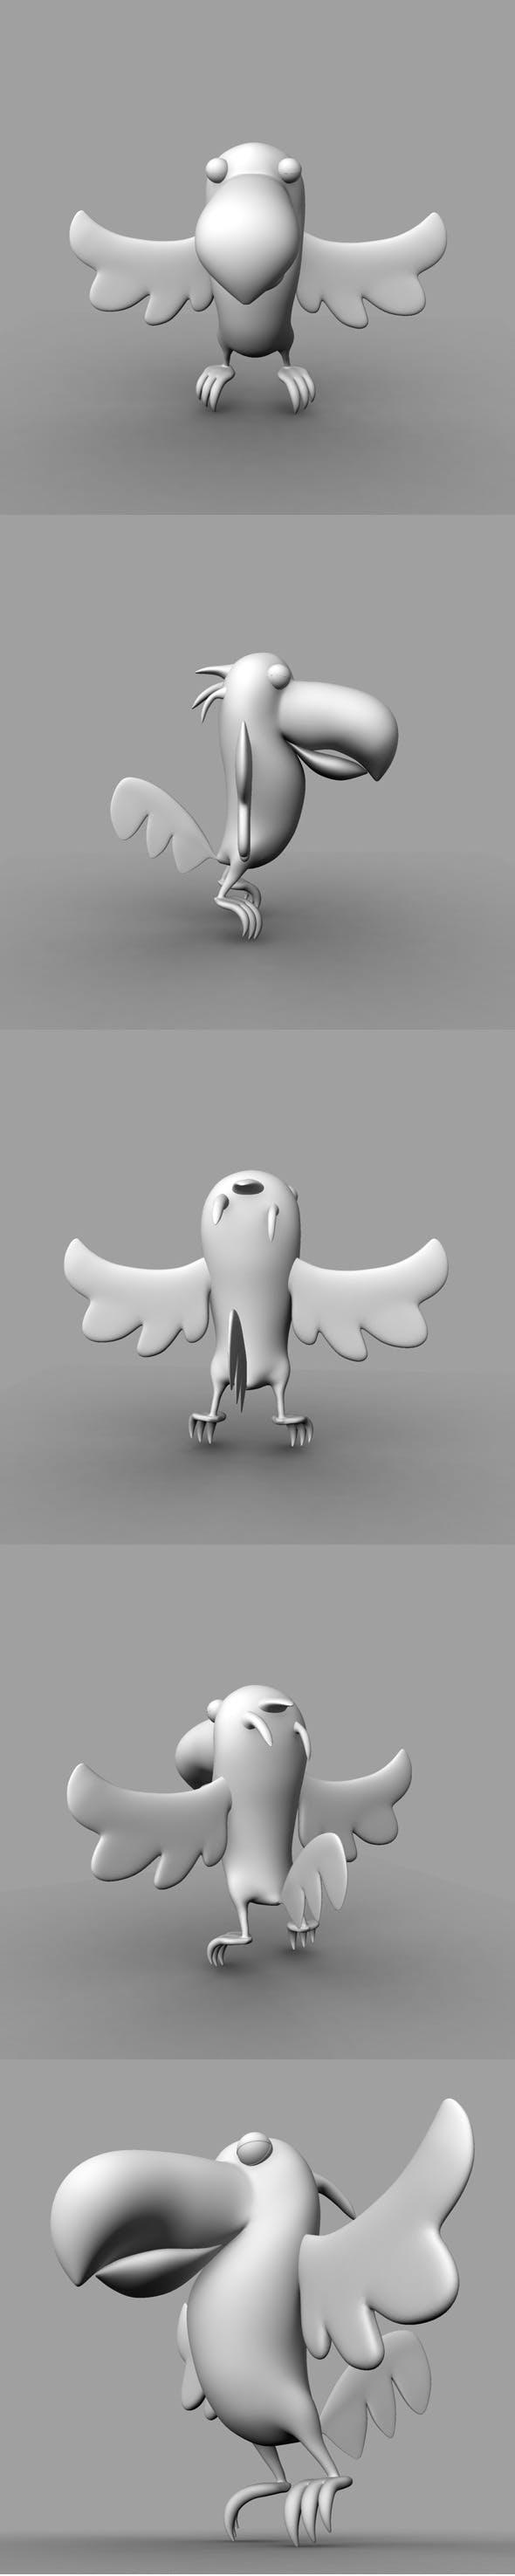 Cartoon Bird Model - 3DOcean Item for Sale